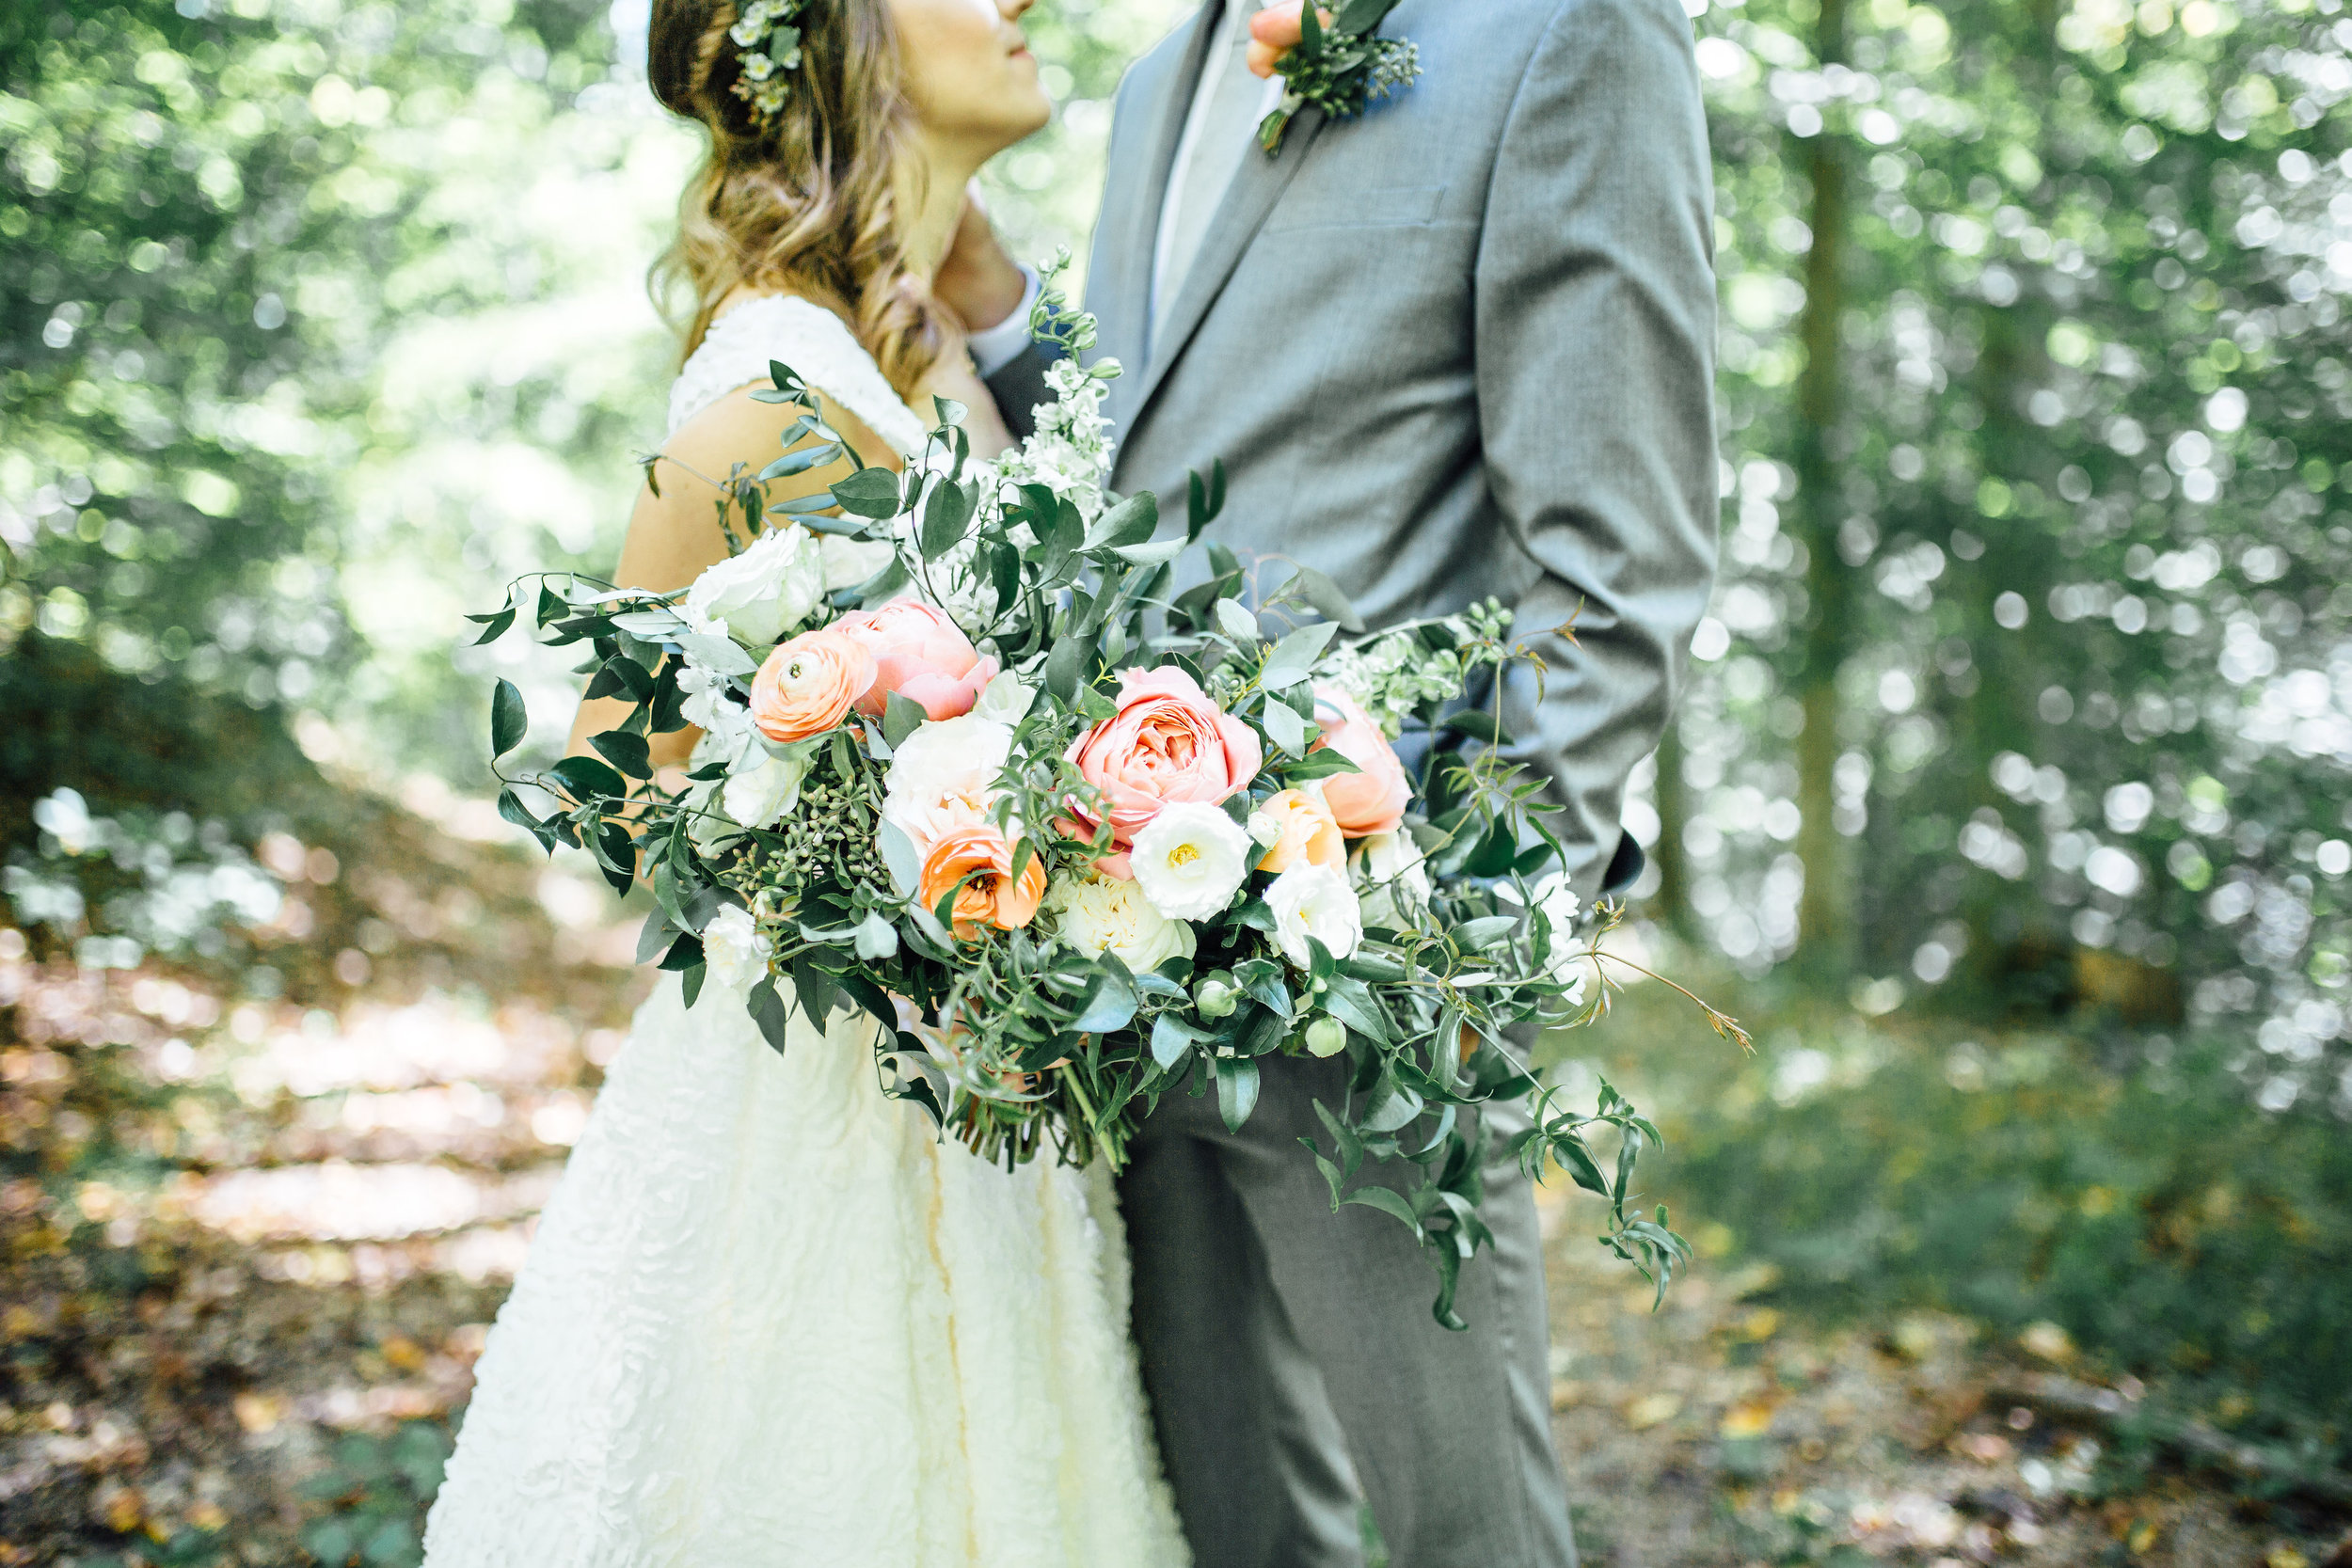 Natural, organic bridal bouquet with garden roses and ranunculus // Nashville Wedding Florist